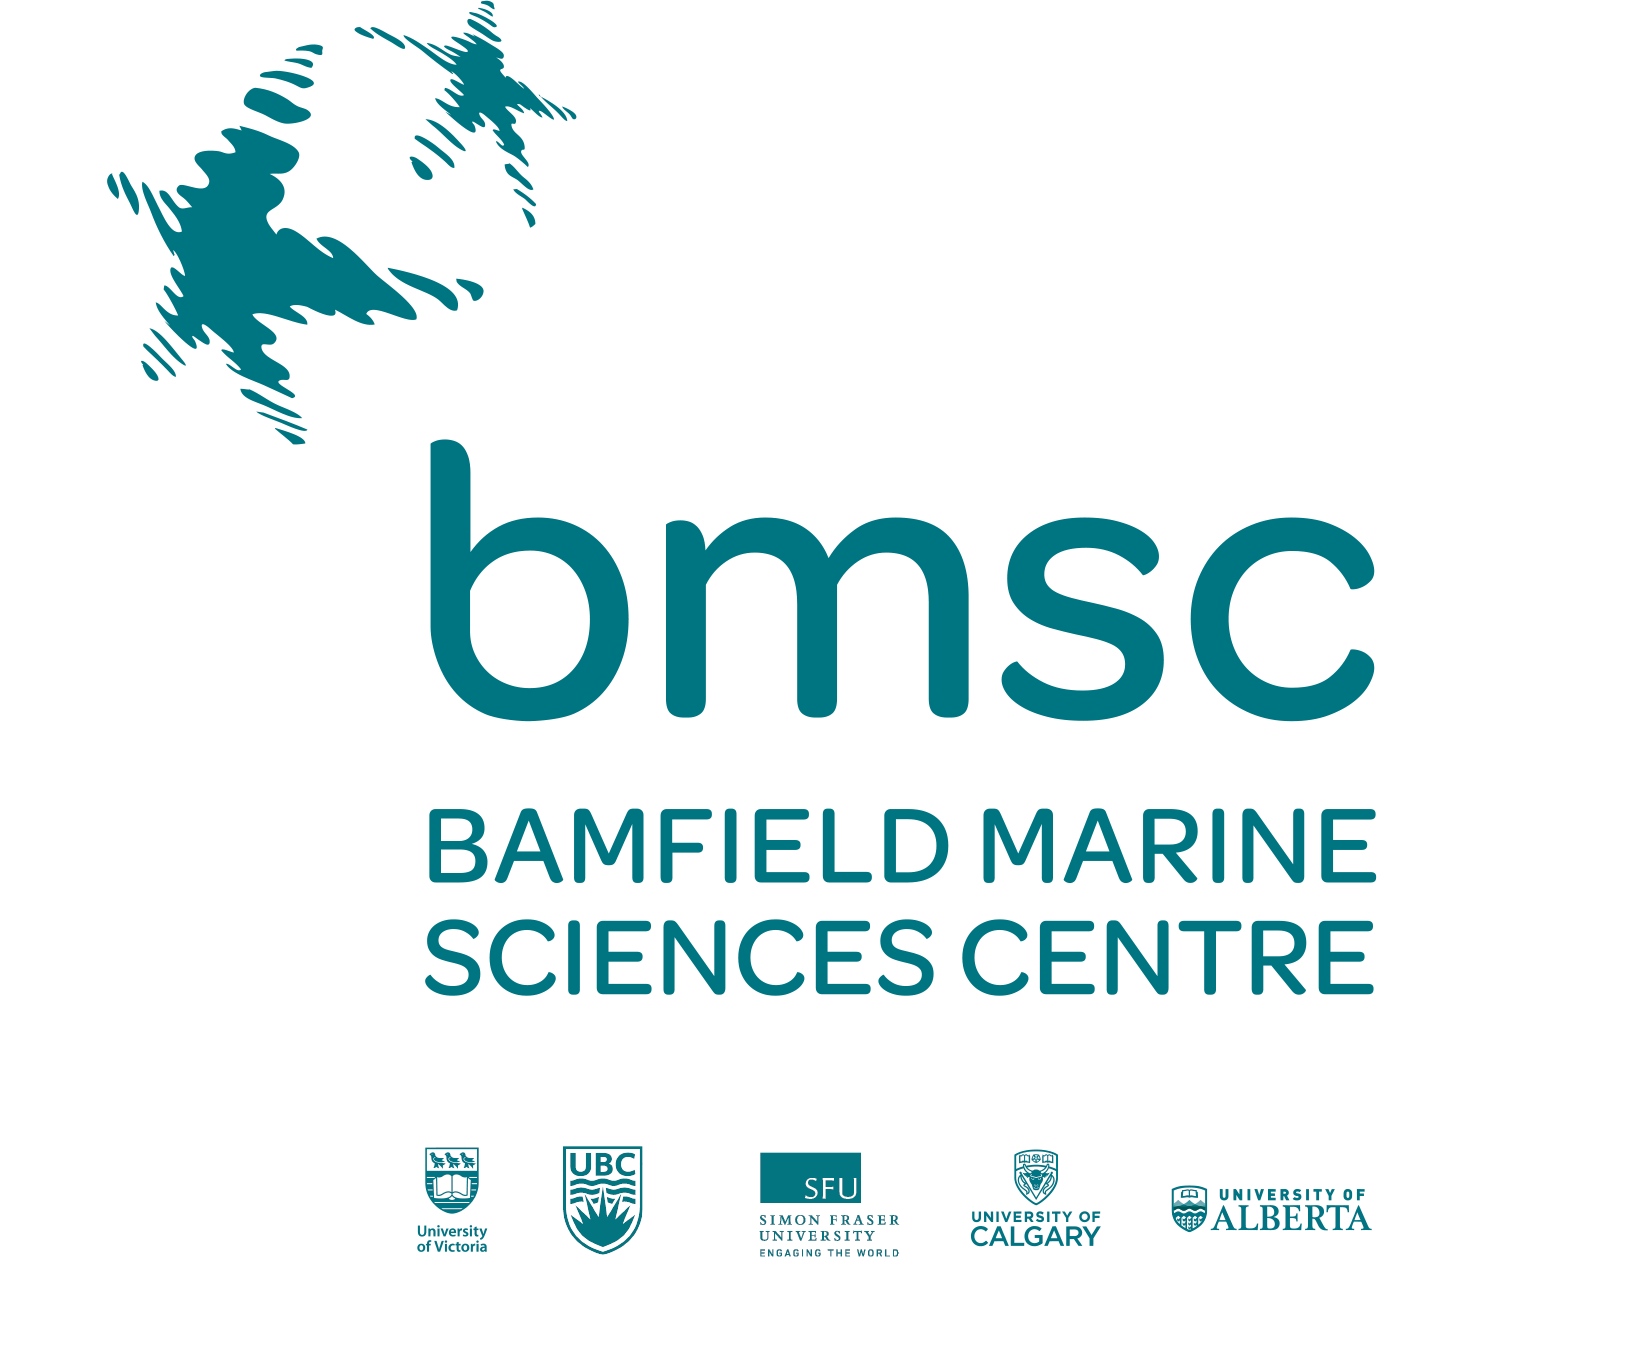 Bamfield Marine Sciences Centre (Canada)